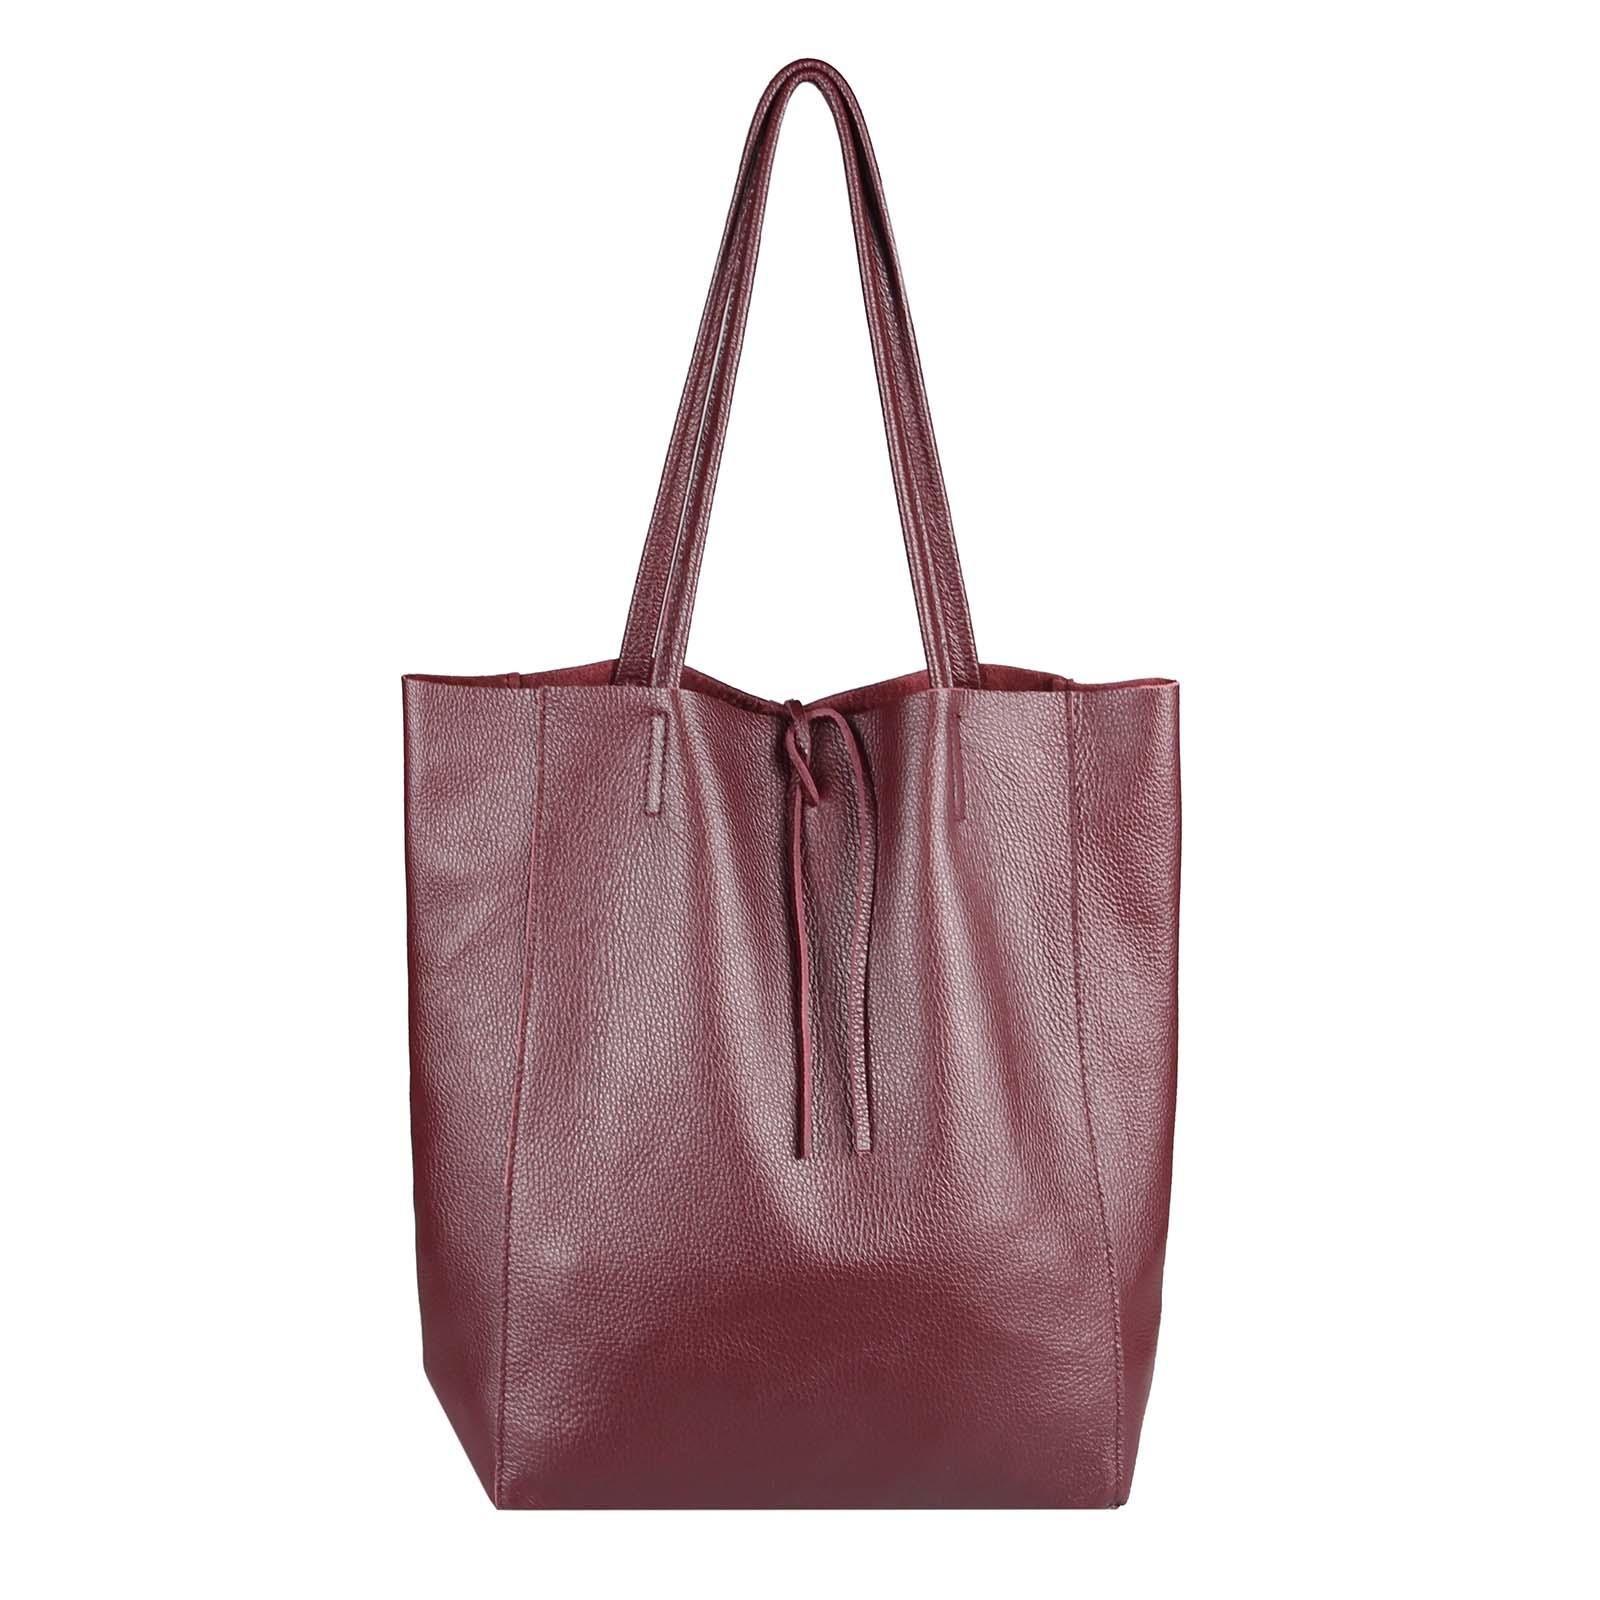 ccbd2483b1ada OBC Made in Italy DAMEN LEDER TASCHE DIN-A4 Shopper Schultertasche  Henkeltasche Tote Bag Metallic Handtasche Umhängetasche Beuteltasche…